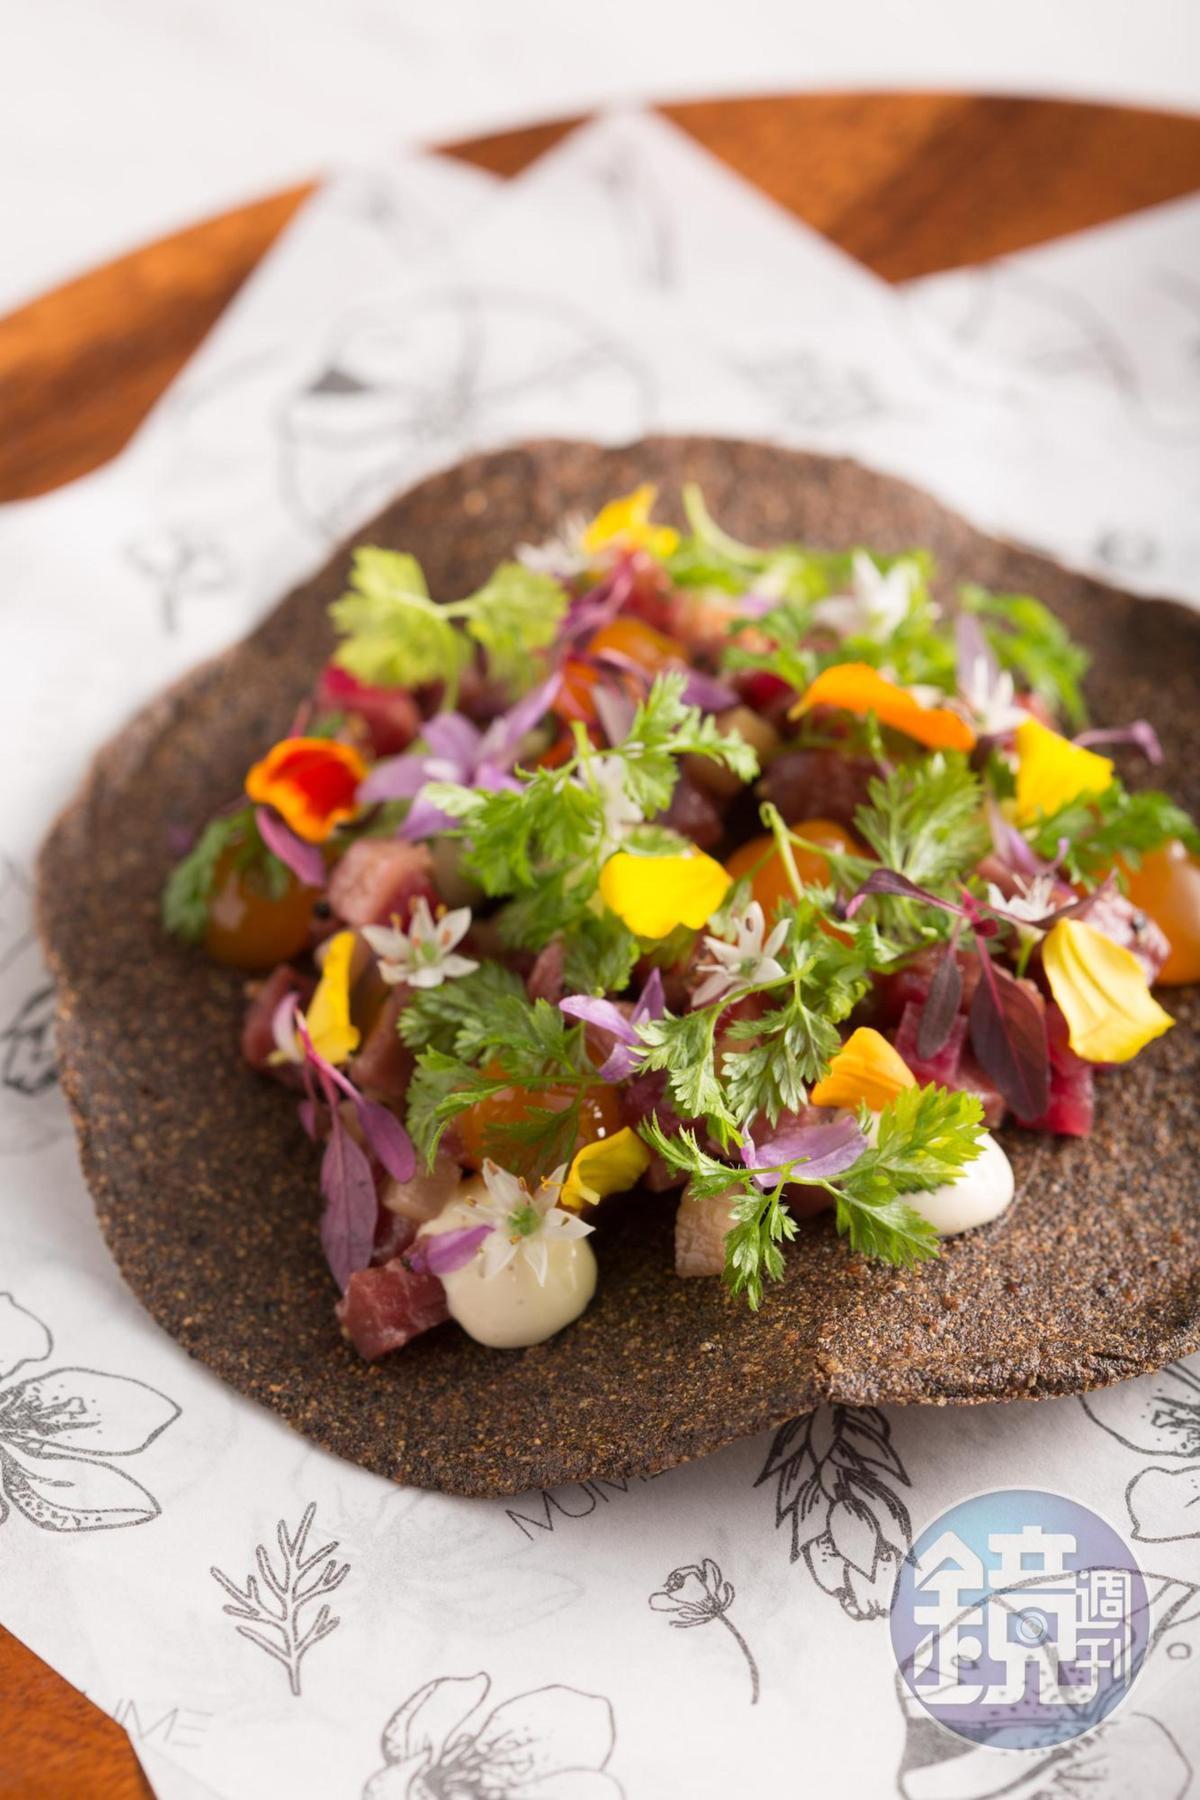 「MUME」的「紅藜花卉墨西哥餅」上的石蒜花帶嗆味,勾出生牛肉的鮮甜。